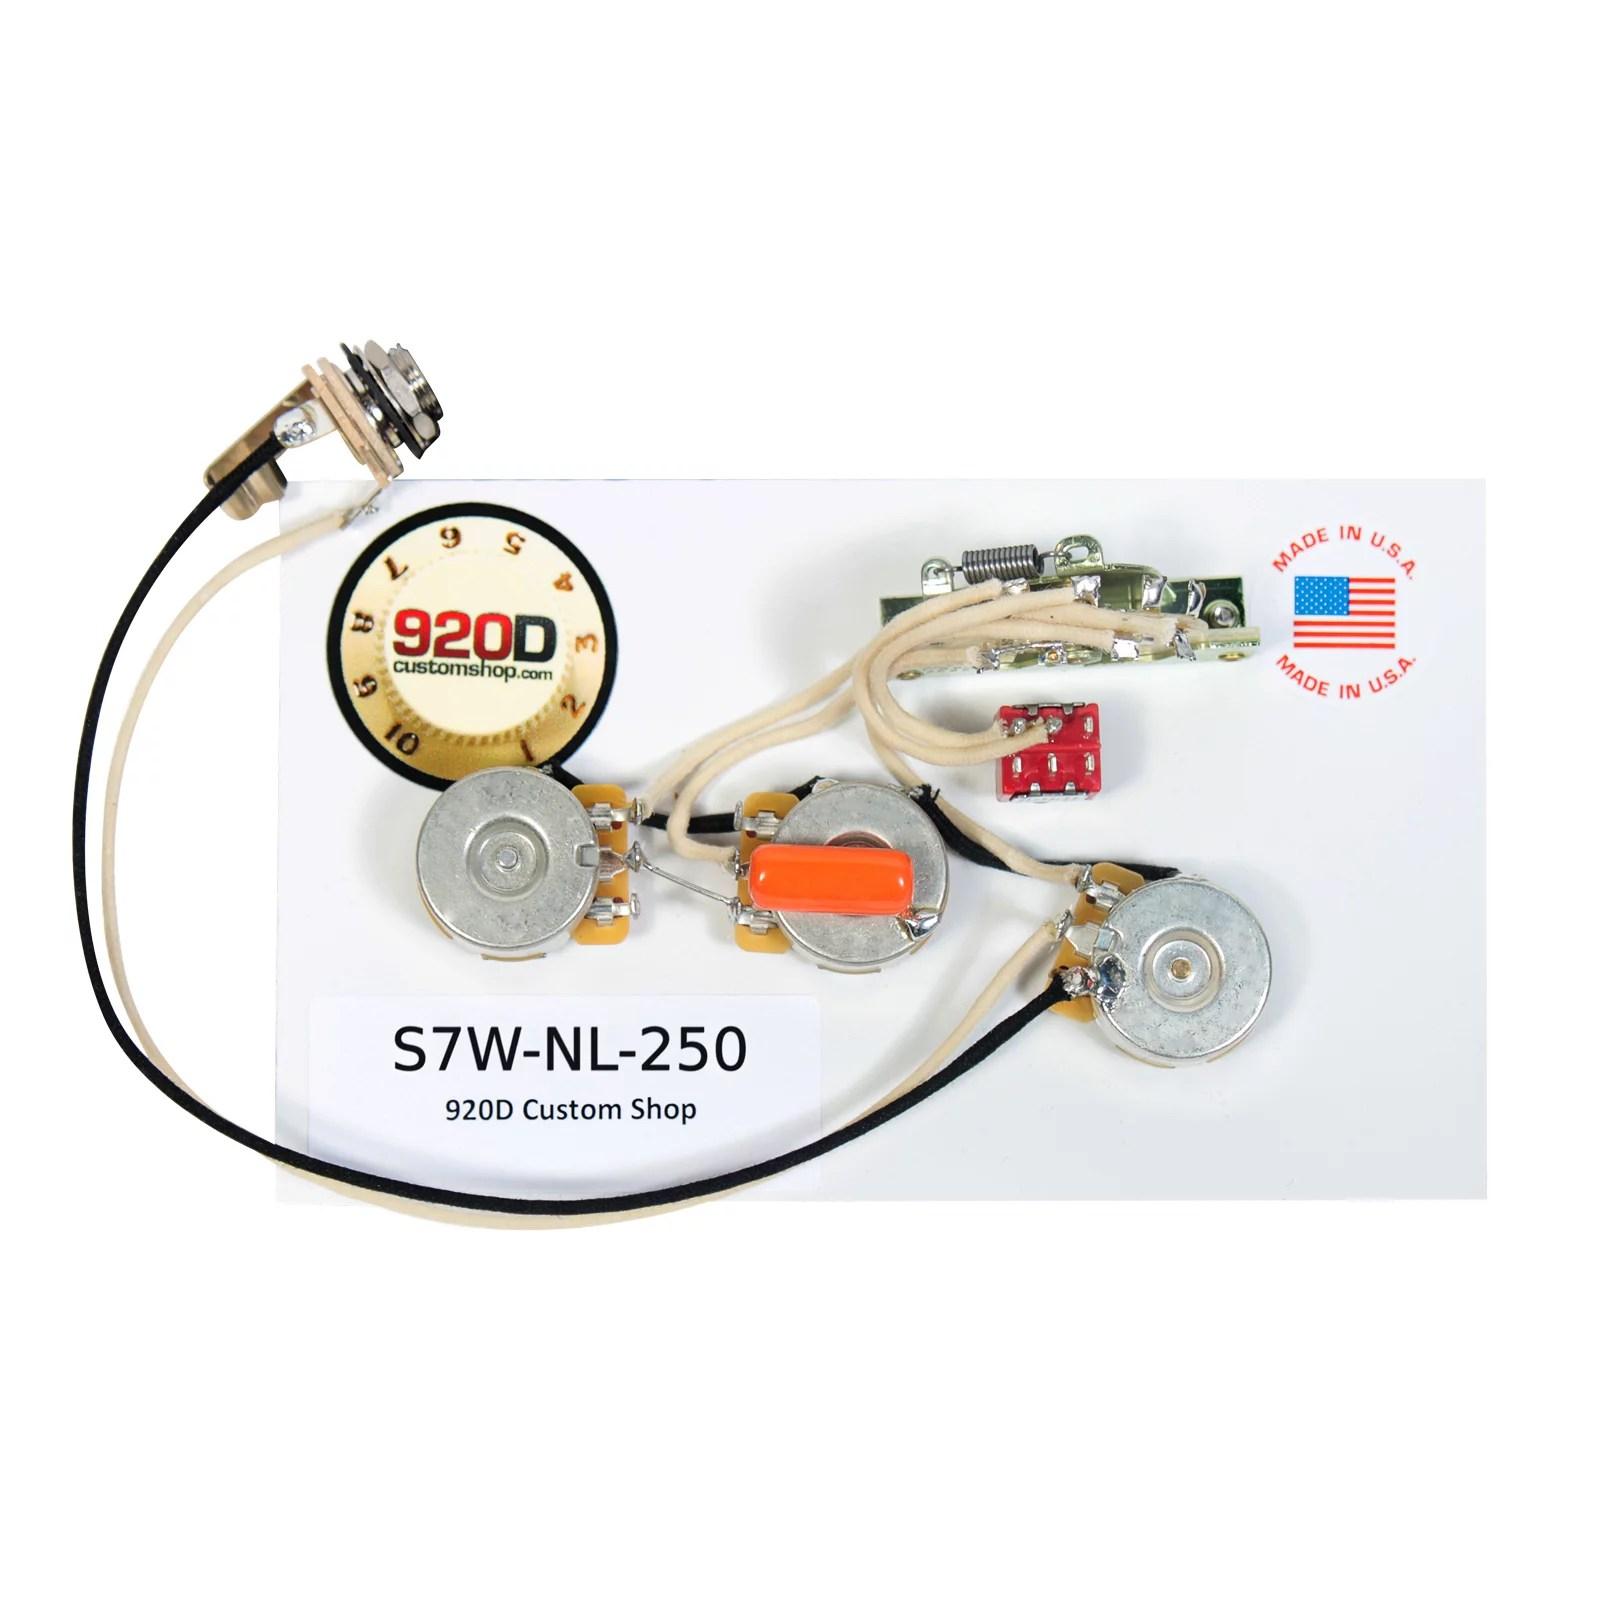 fender strat 7 way wiring kit w 2 no load 250k 022 f cap fender esquire wiring kit fender wiring kit [ 1600 x 1600 Pixel ]